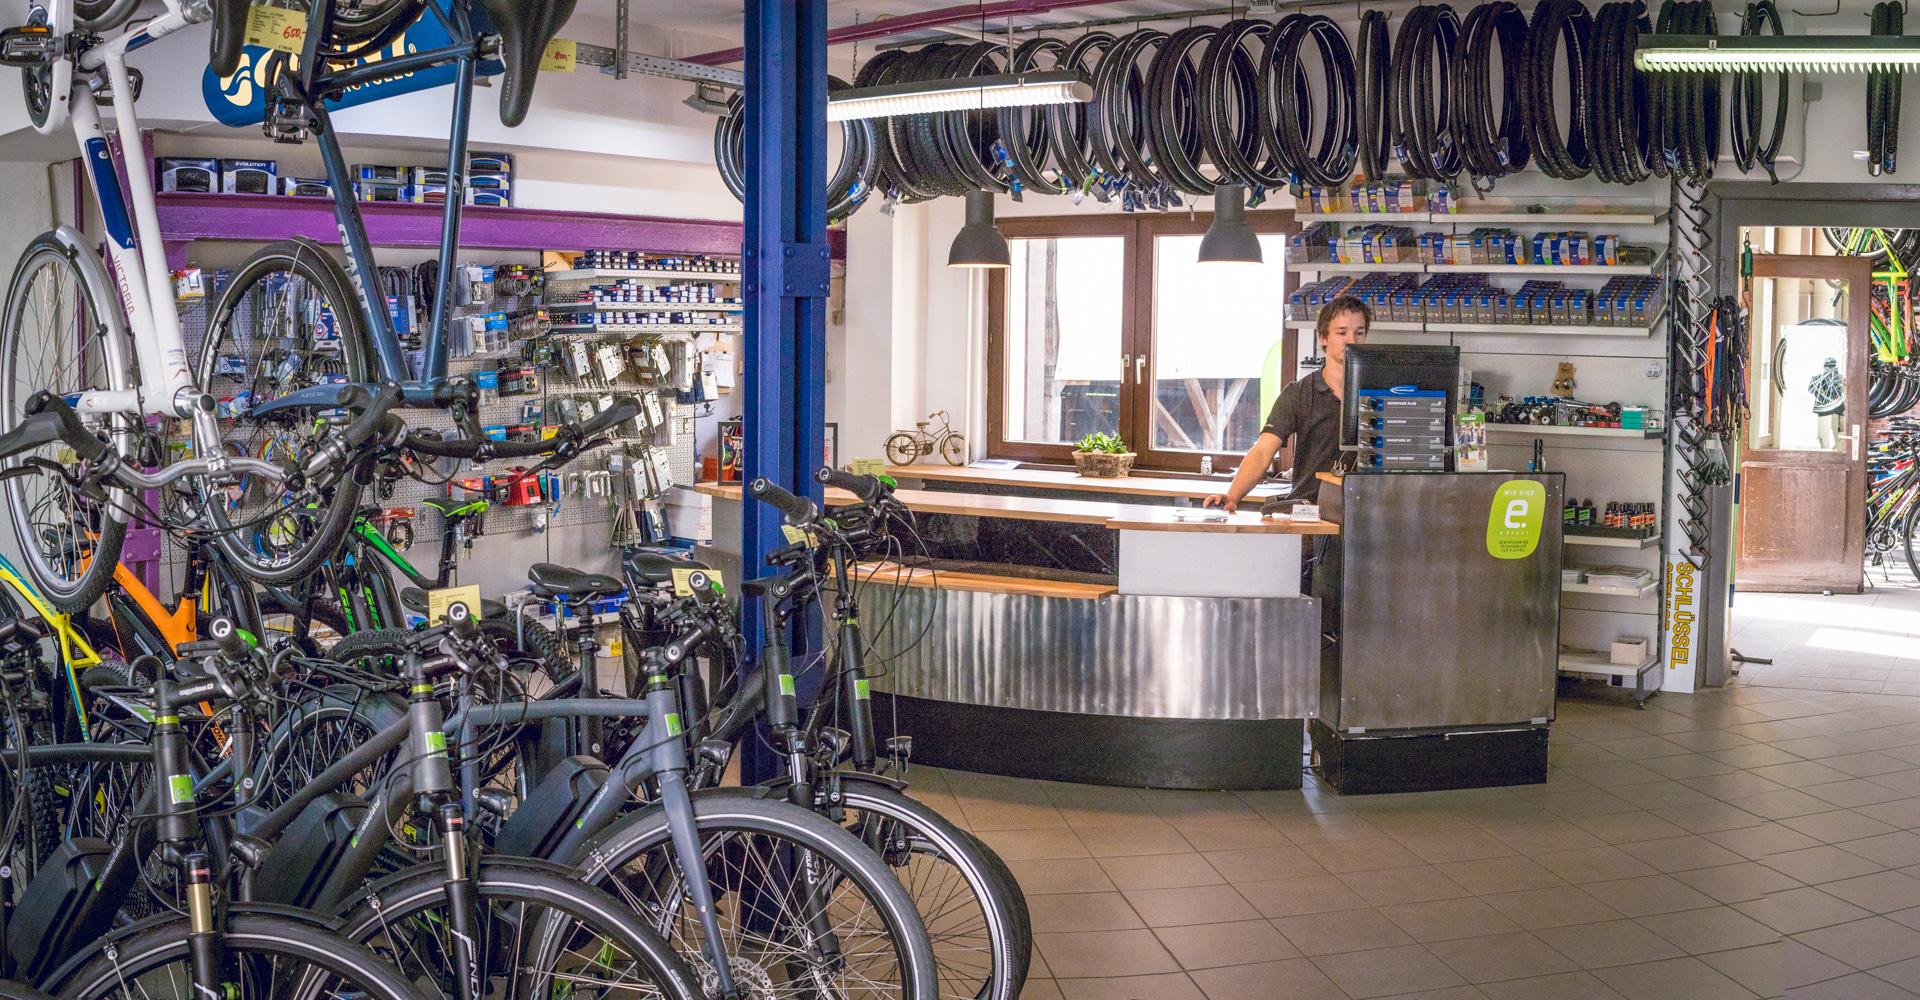 Rudis Radladen - Verkaufsraum